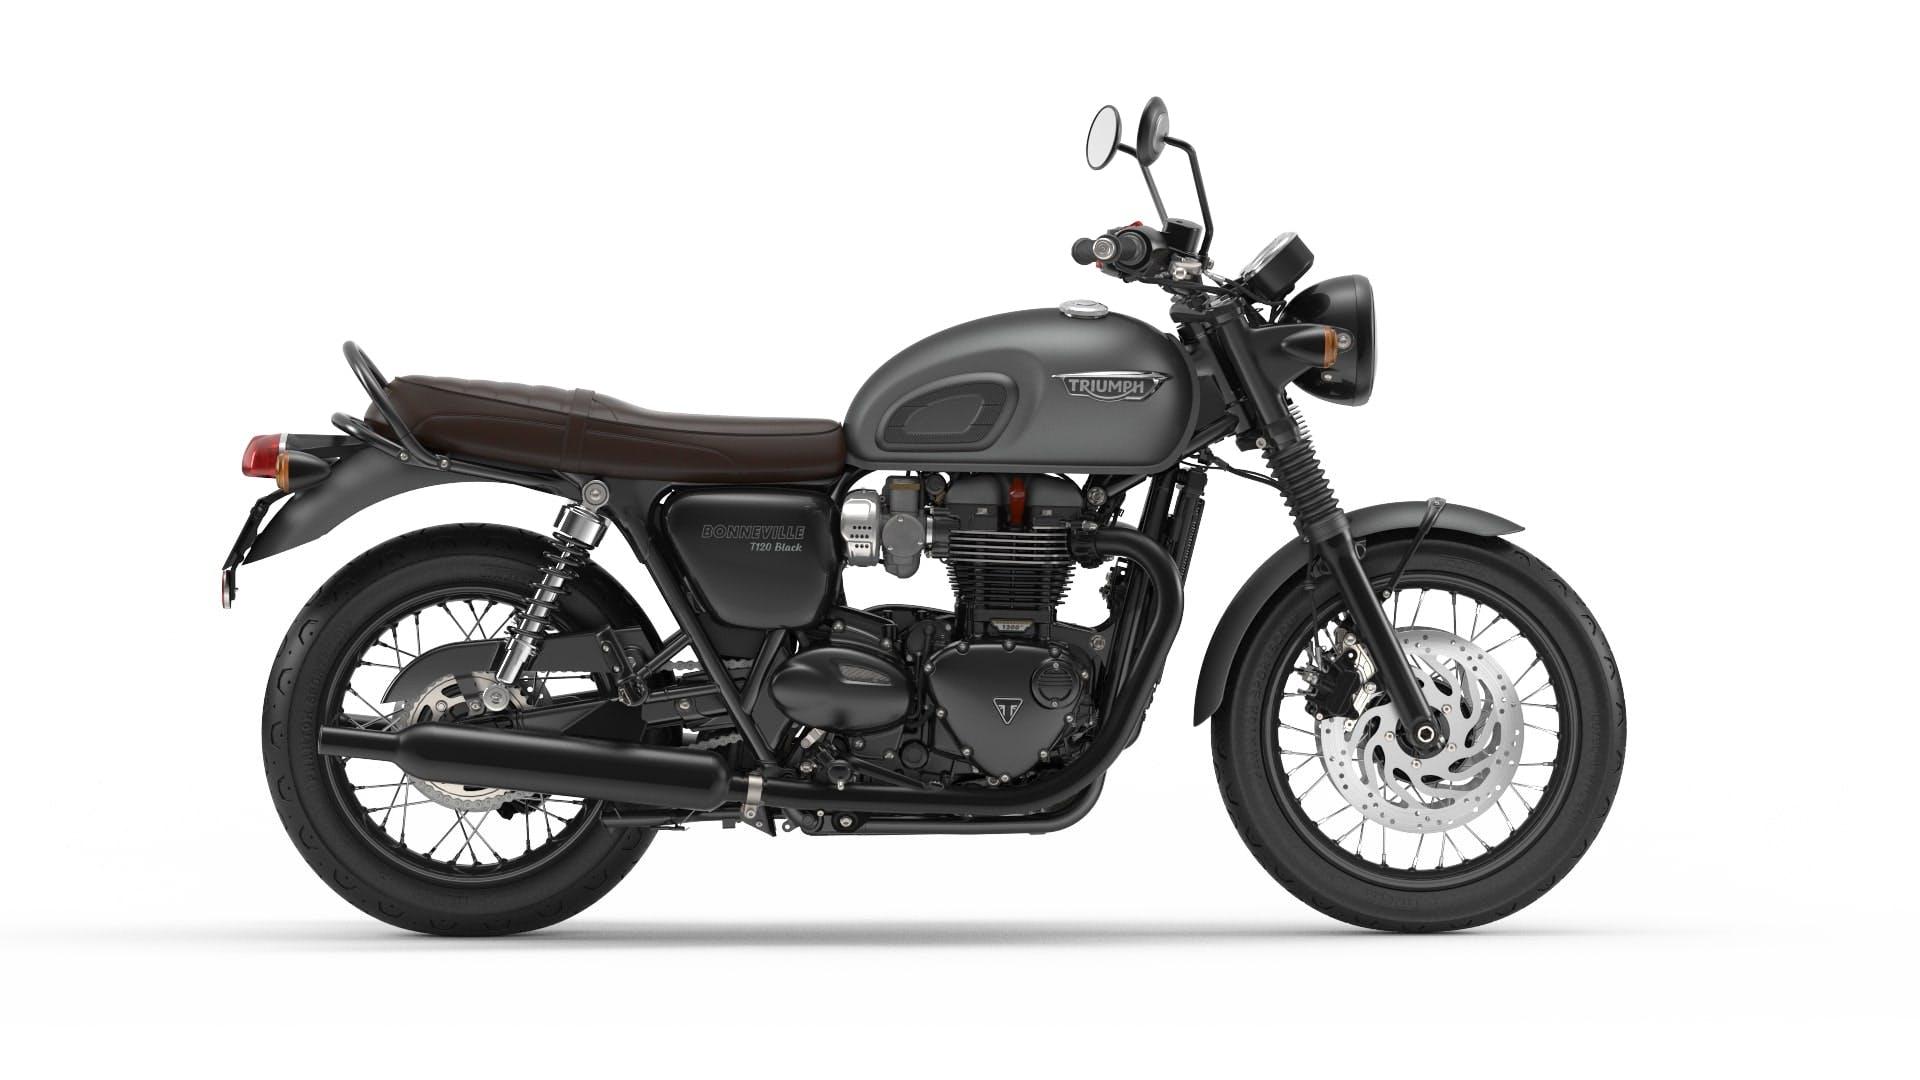 TRIUMPH Bonneville T120 Black in matt graphite colour